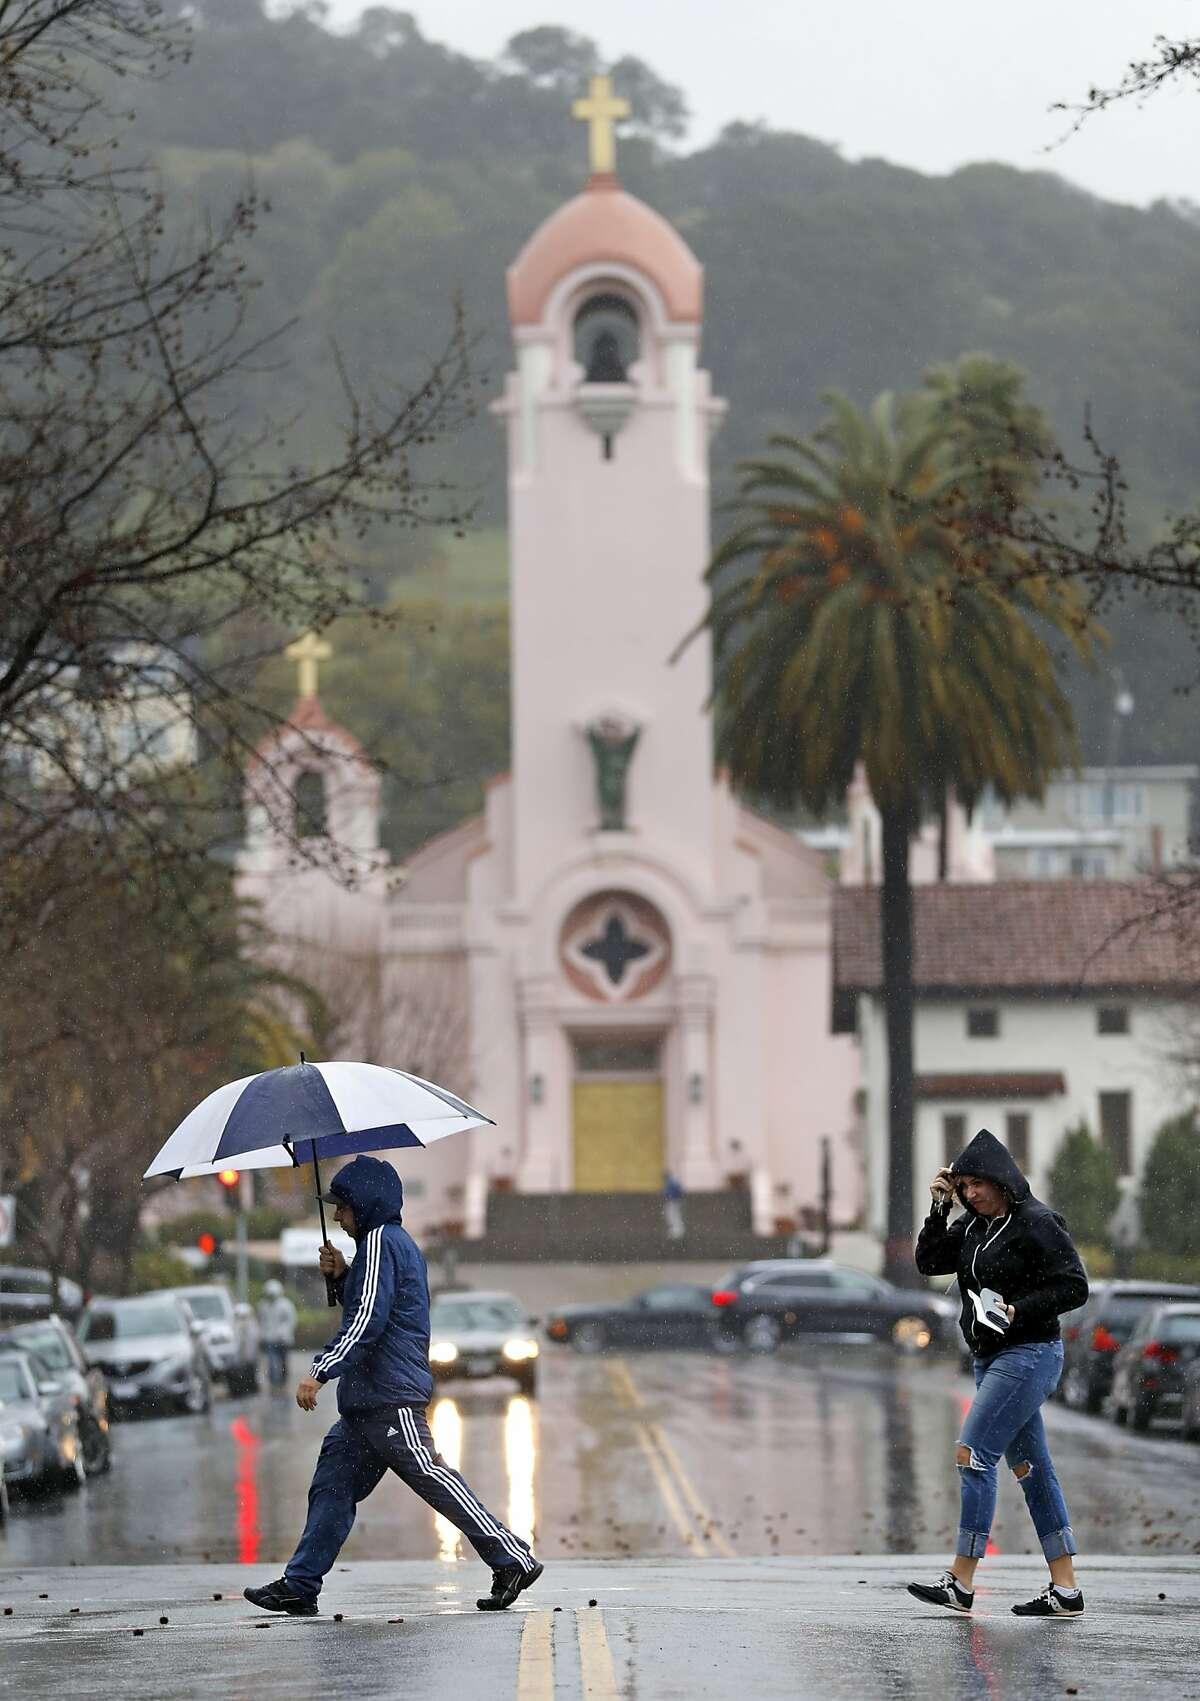 As a steady rain falls, pedestrians cross A Street on Fourth Street in San Rafael, Calif., on Monday, February 25, 2019.